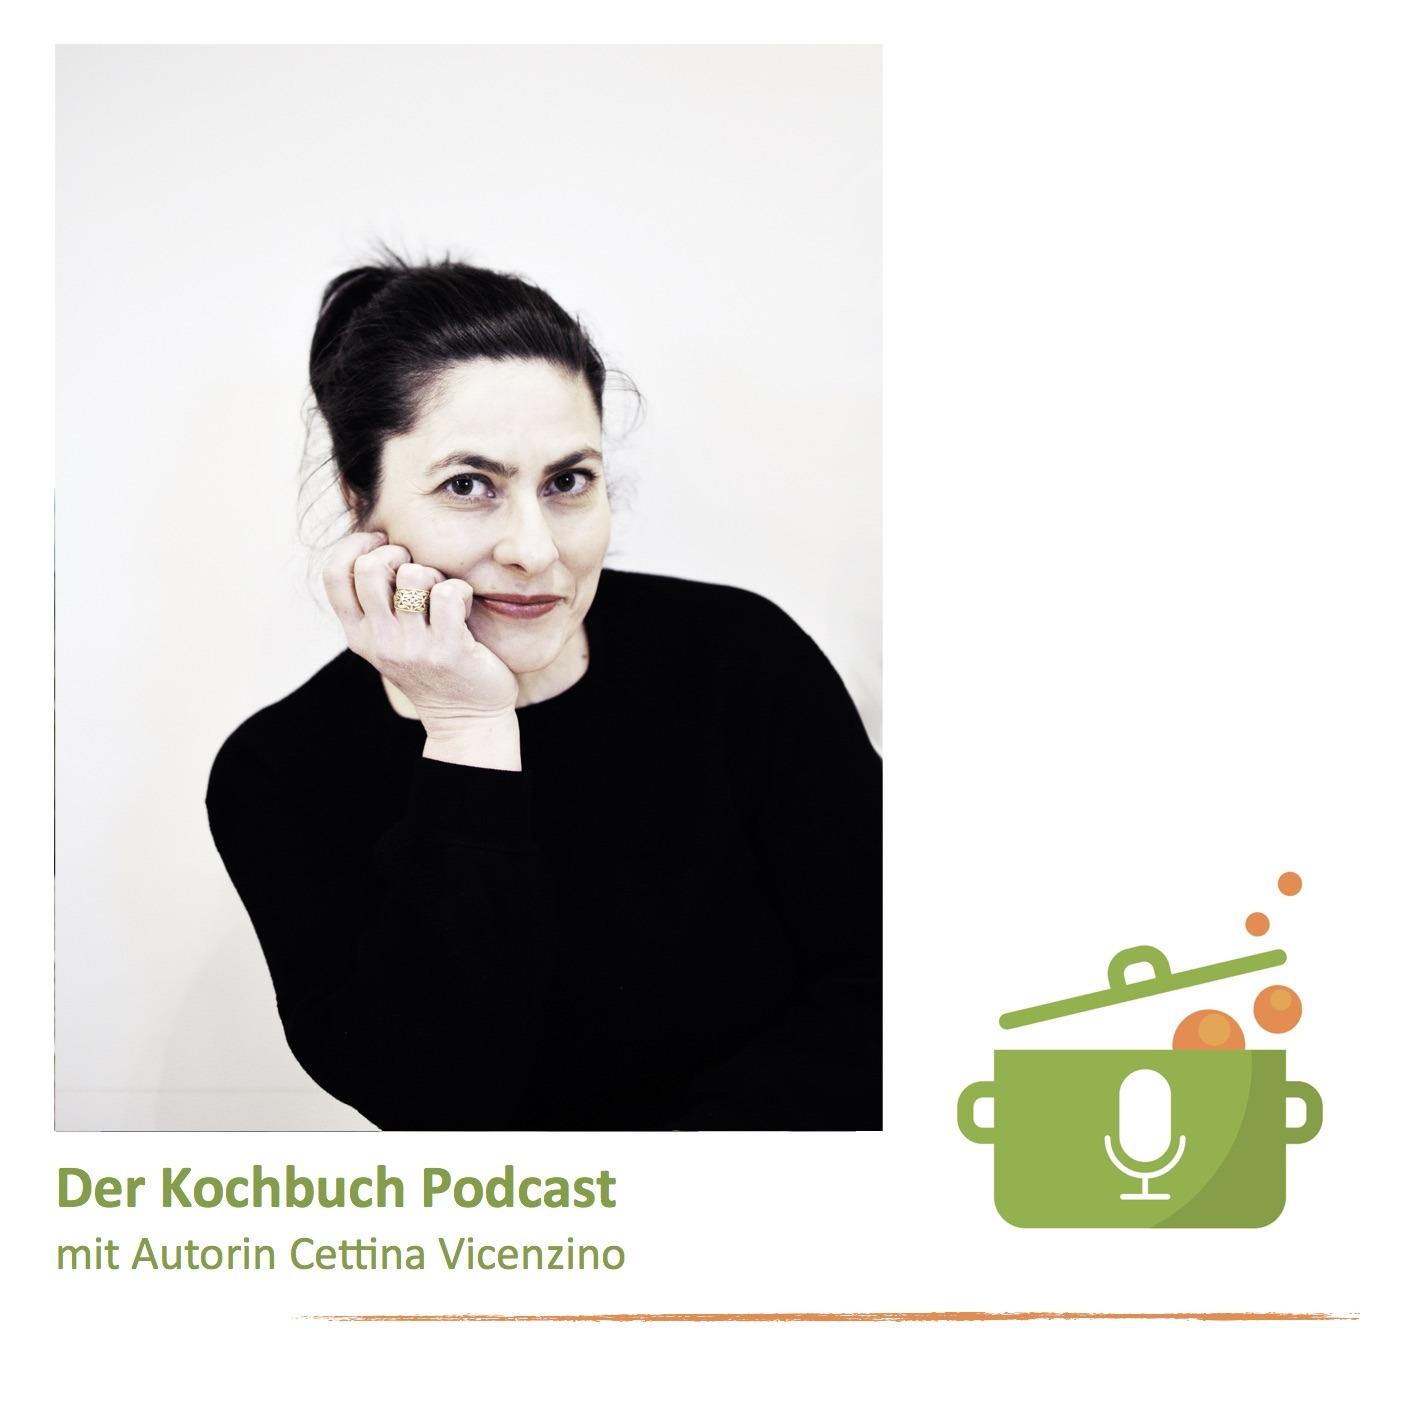 Der Kochbuch Podcast mit Cettina Vicenzino